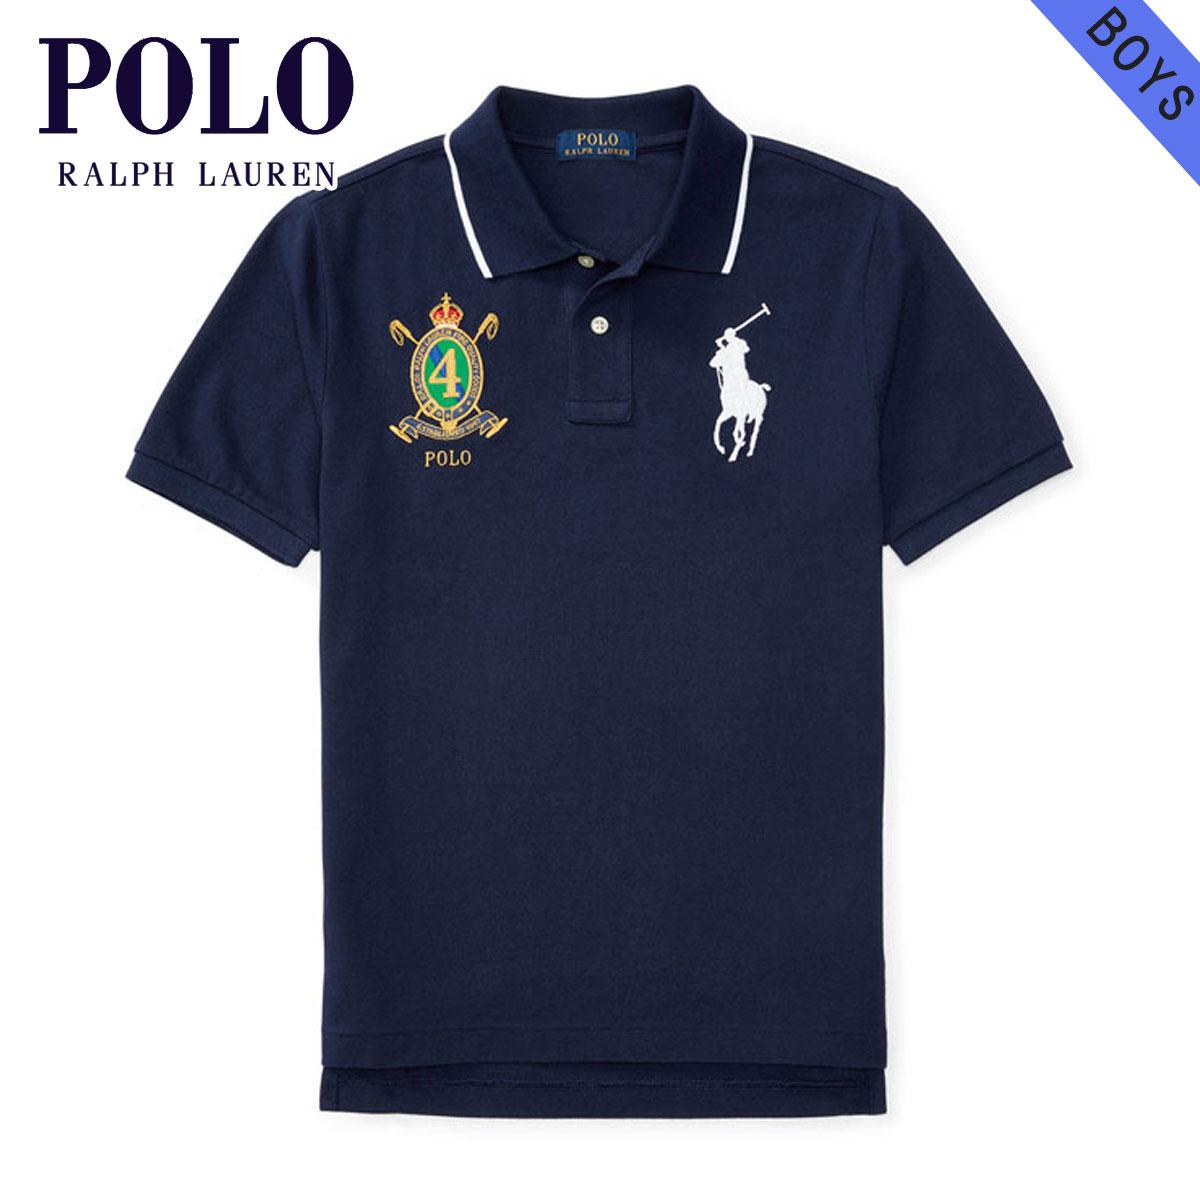 9725c94474a6 Polo Ralph Lauren kids POLO RALPH LAUREN CHILDREN regular article children s  clothes Boys polo shirt COTTON MESH POLO SHIRT 112934956